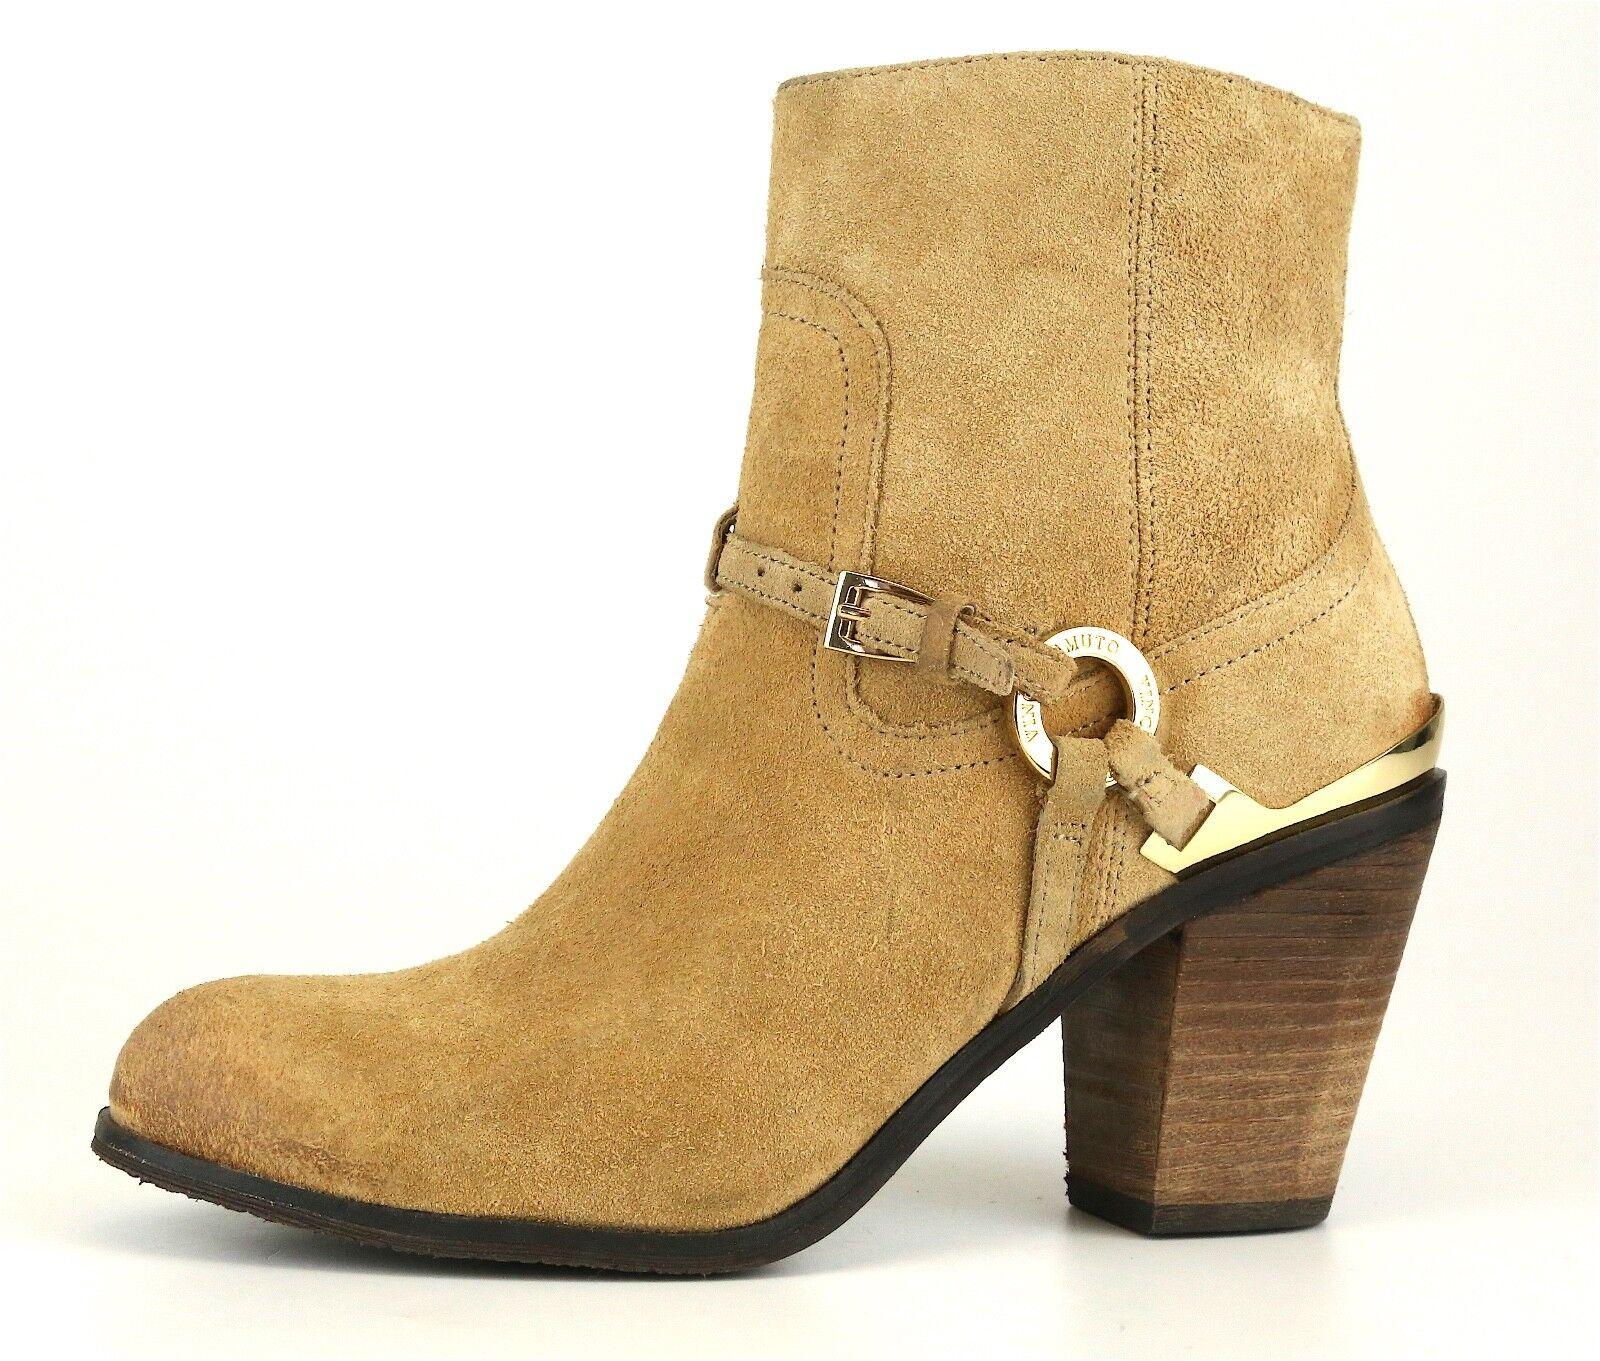 Vince Camuto Gregger Short Suede Boot Brown Women Sz 6.5 M 5239